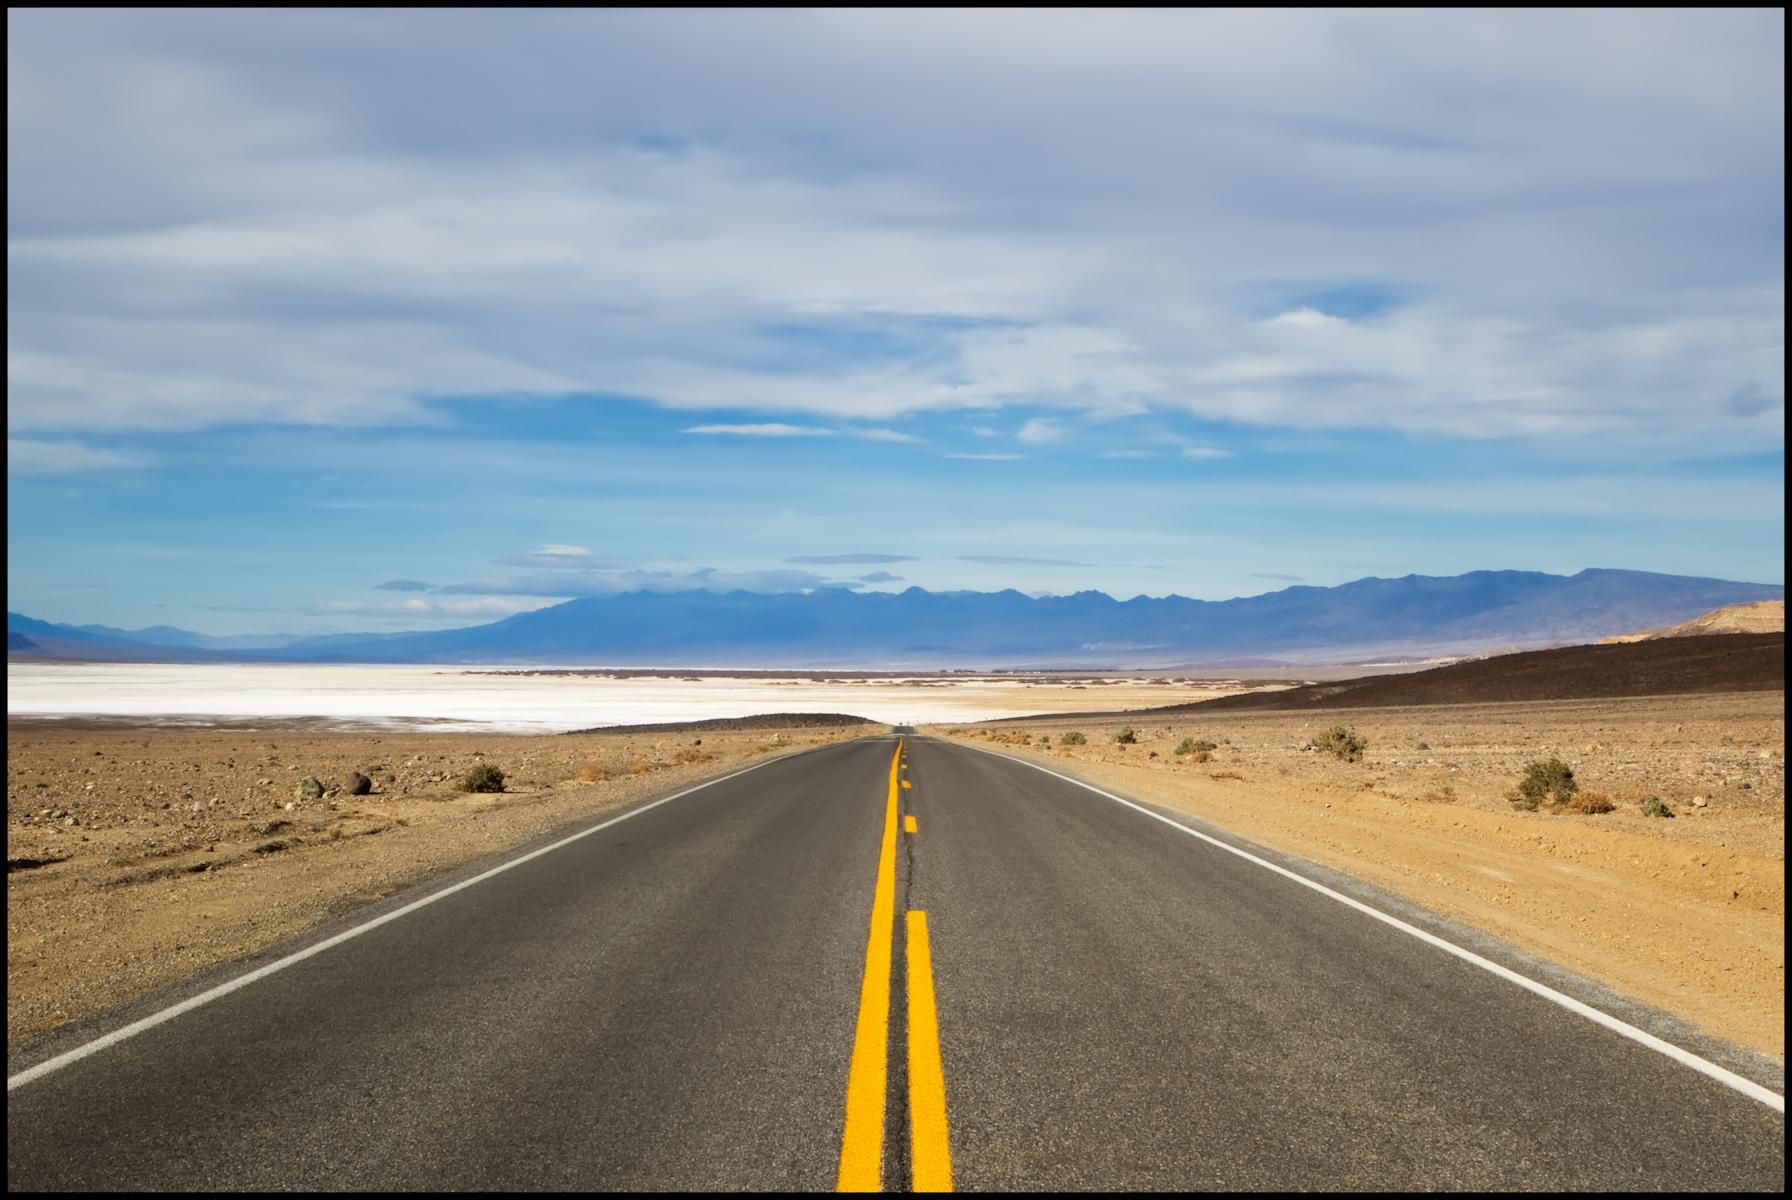 Death_Valley_California_5578743262.jpg